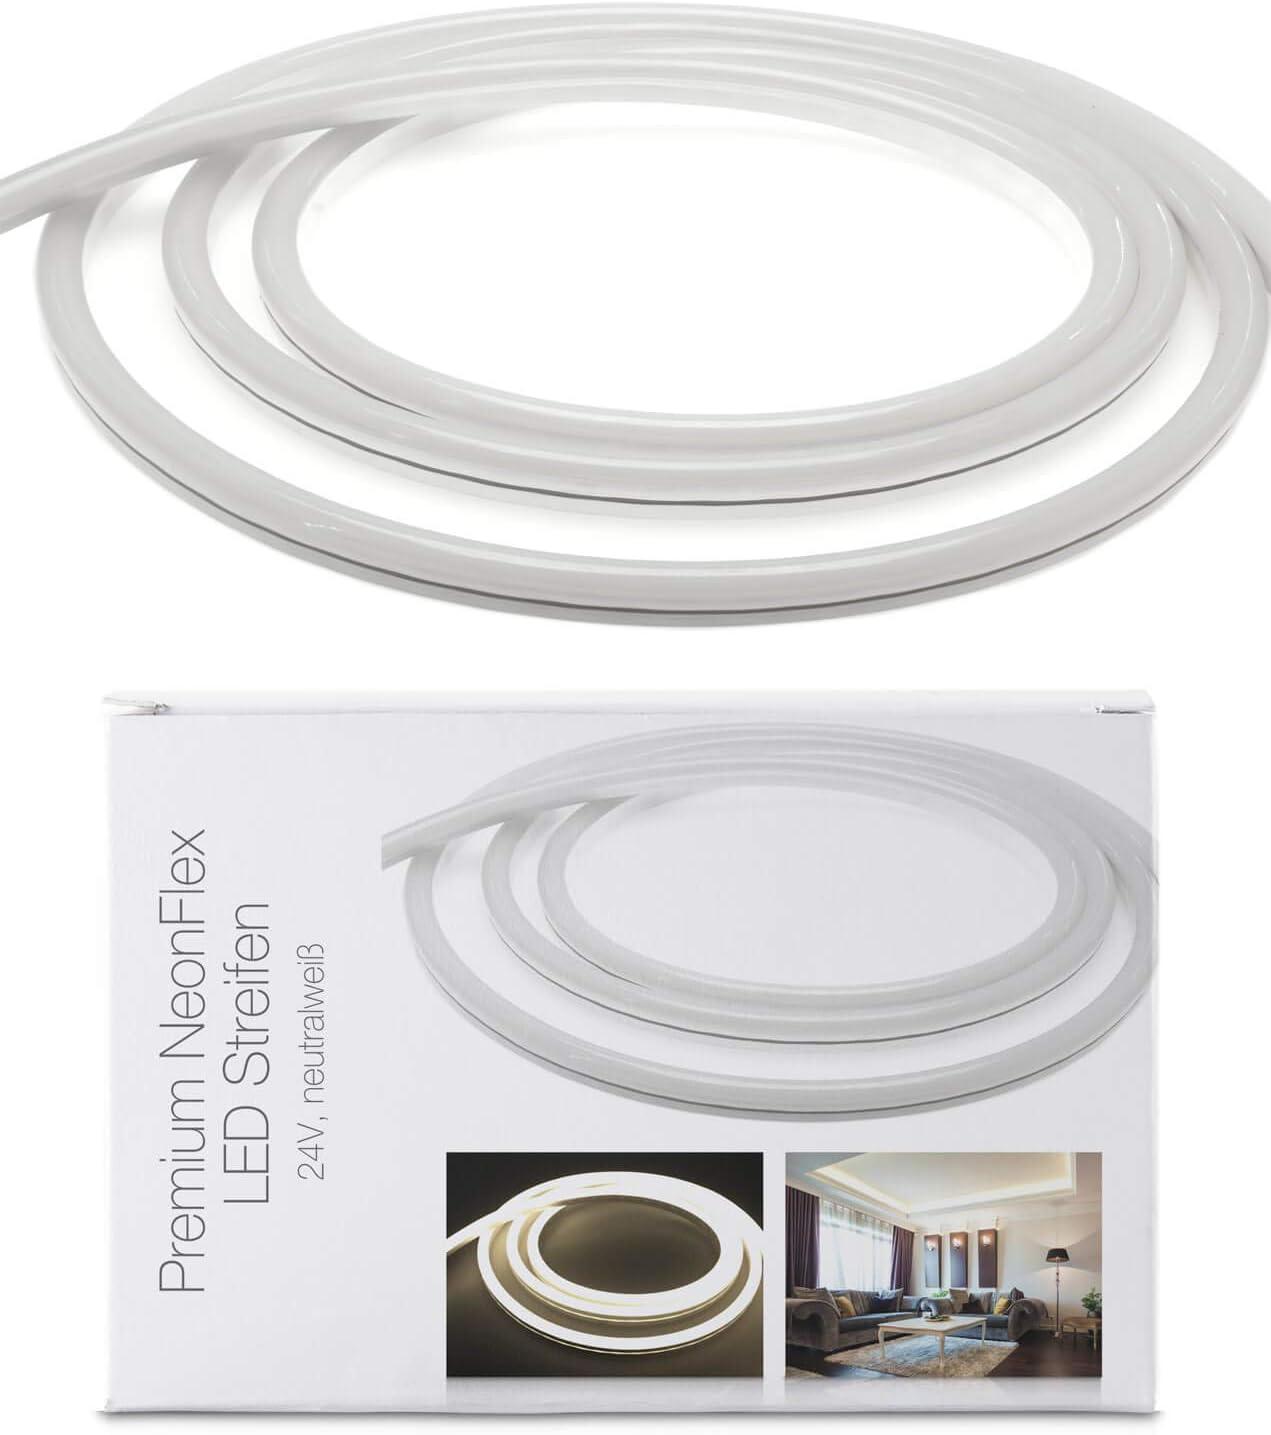 Tira de luces LED Neon Flex de 24 V, IP68, luz blanca neutra, 120 LED/m, 10 m